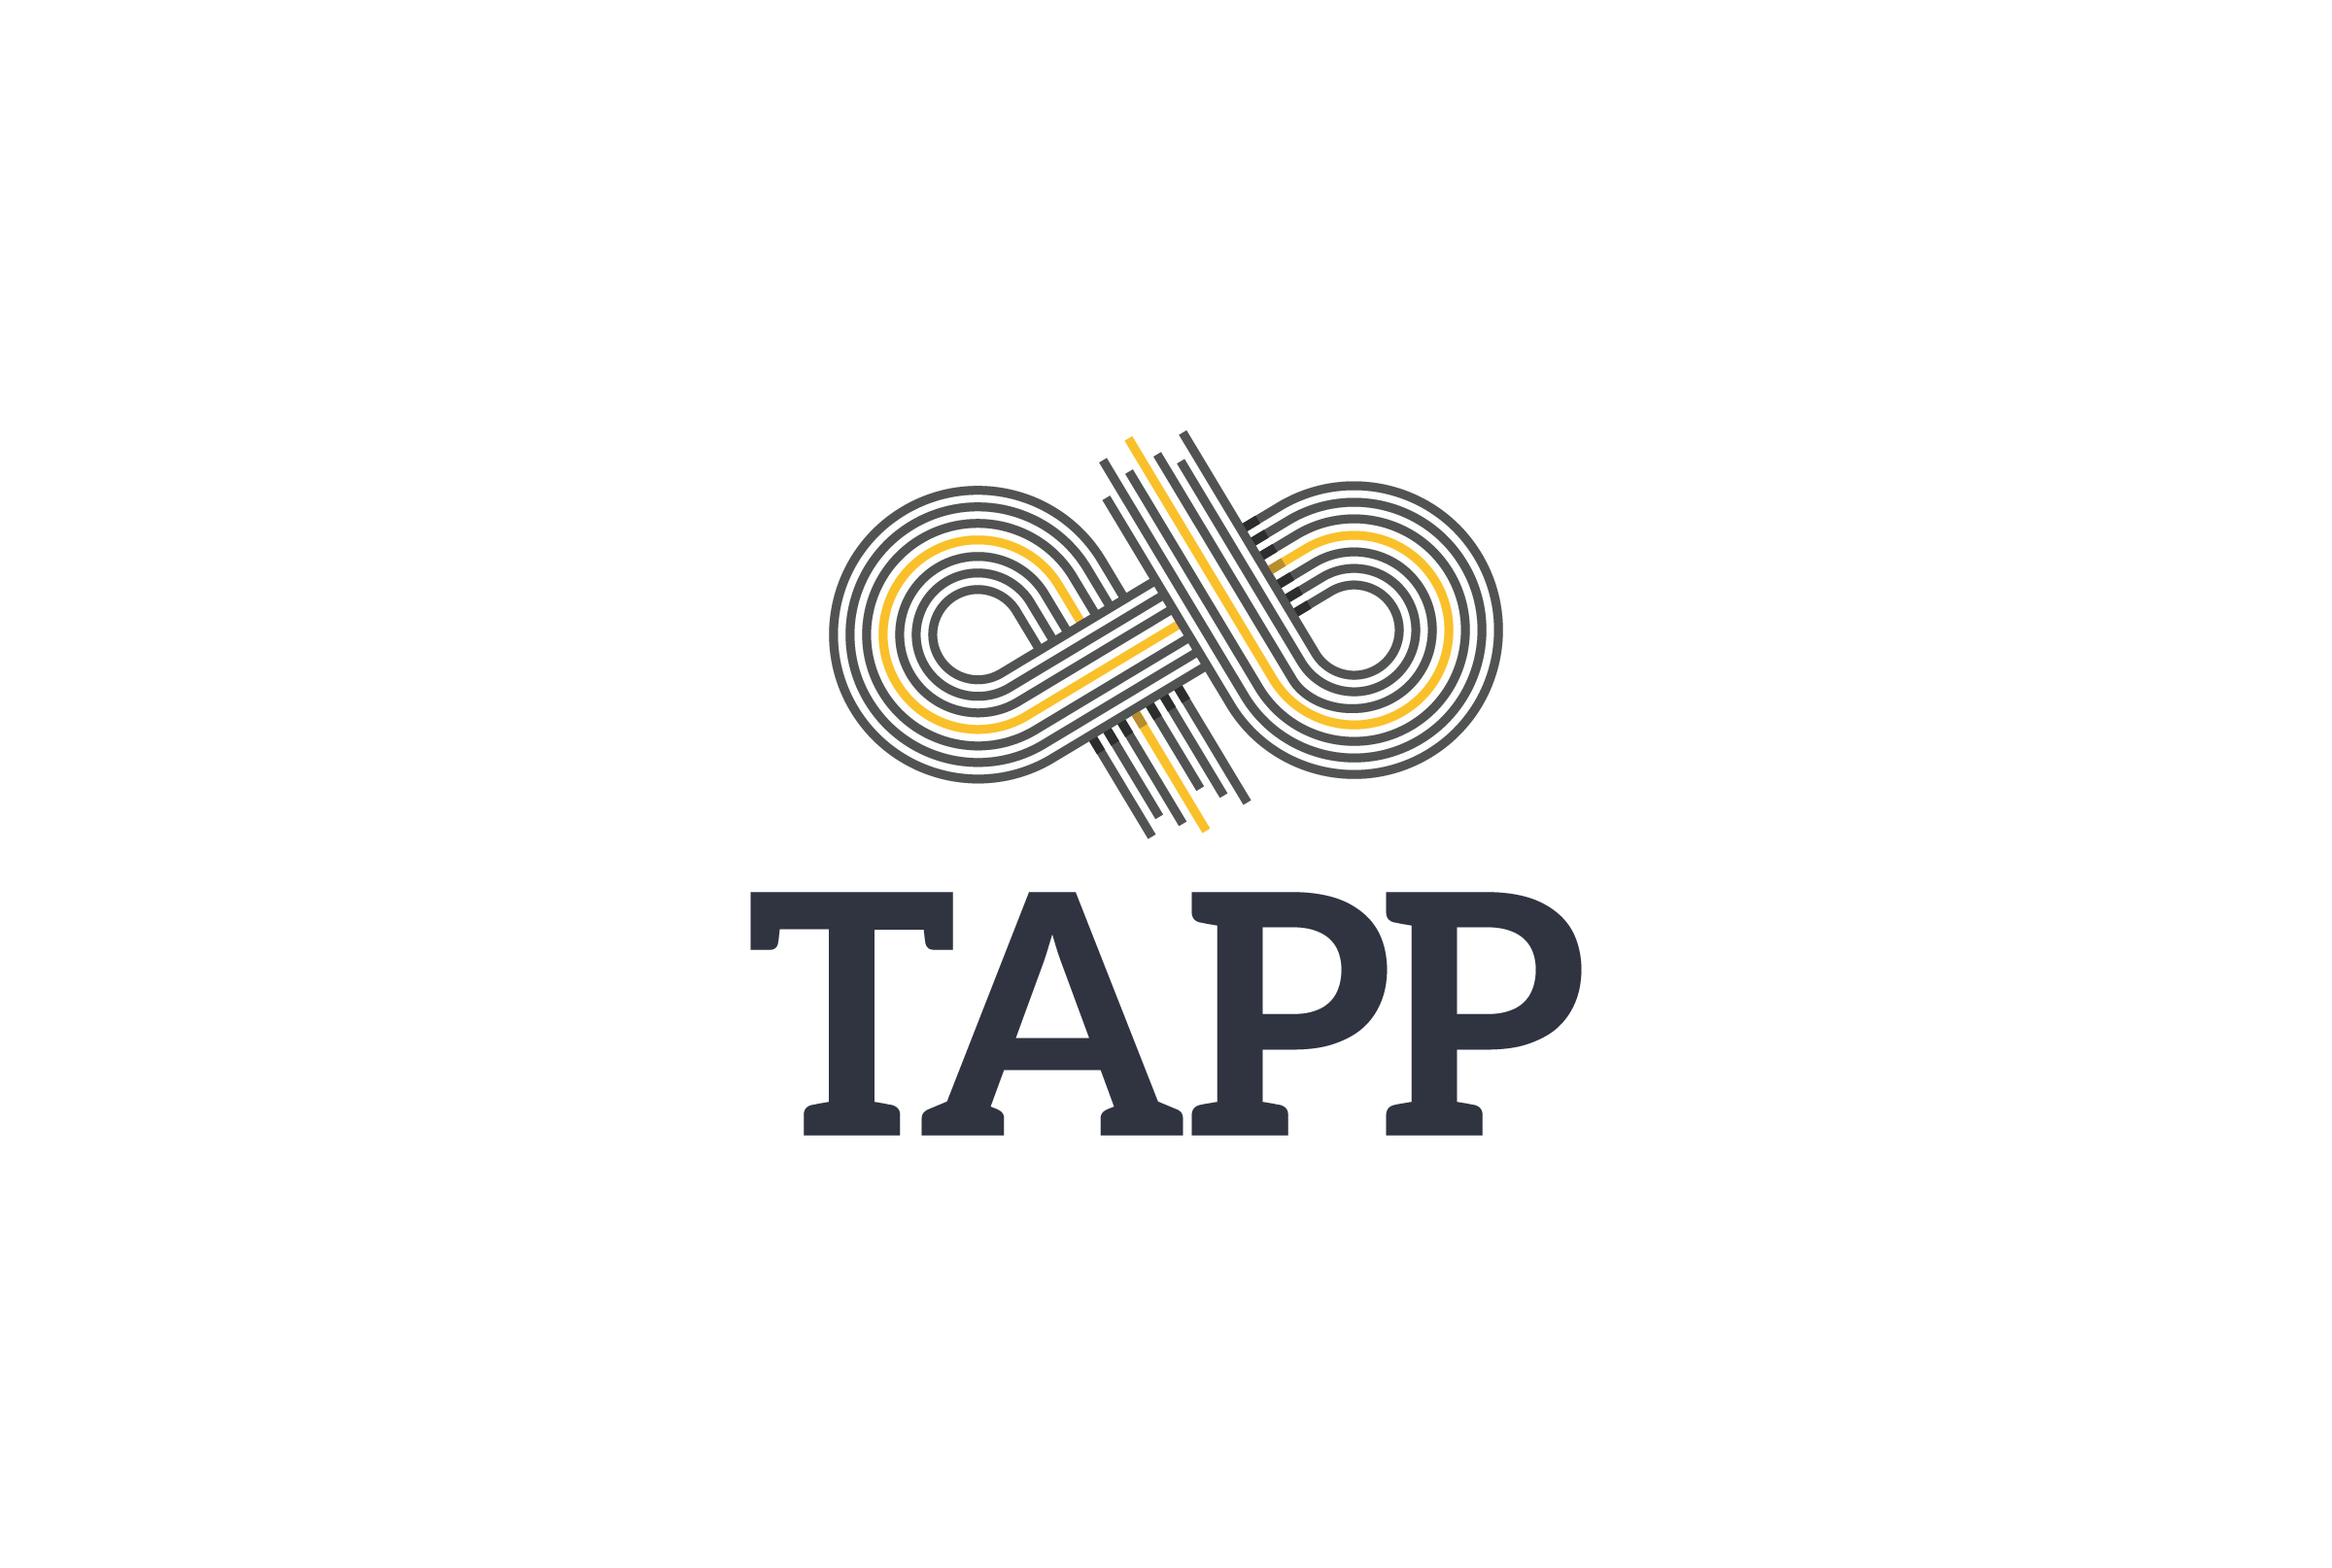 TAPP_MCG_Portfolio-01